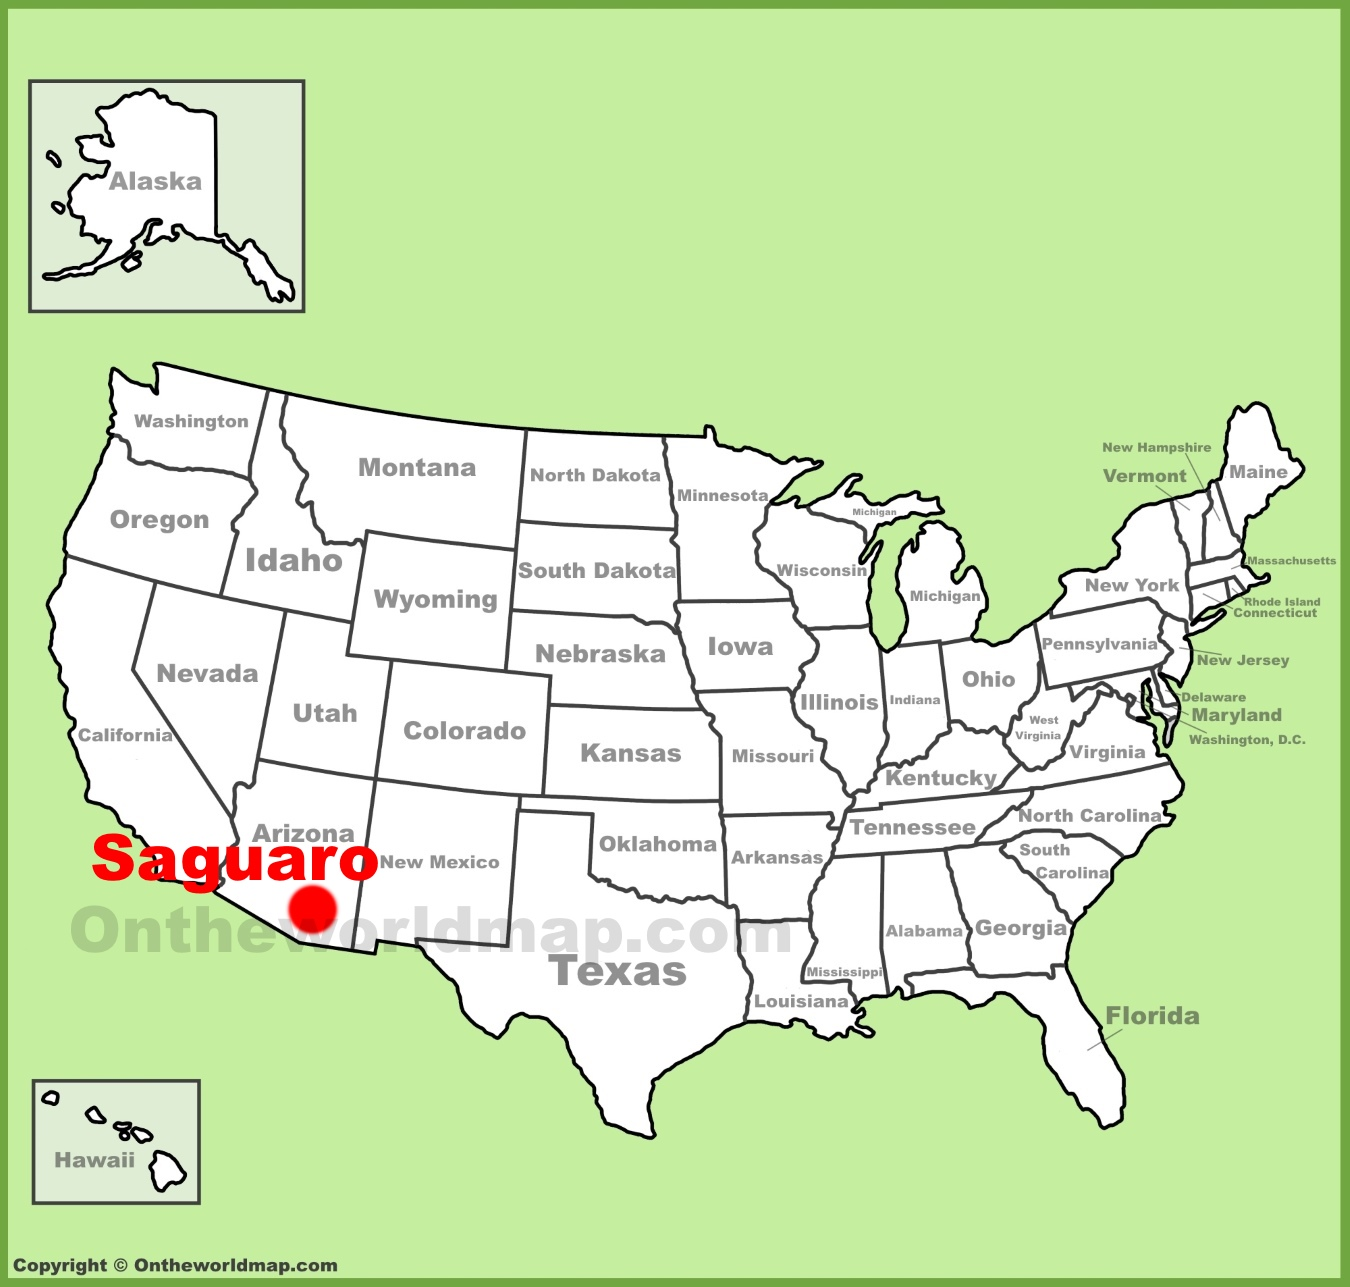 Saguaro National Park location on the U.S. Map